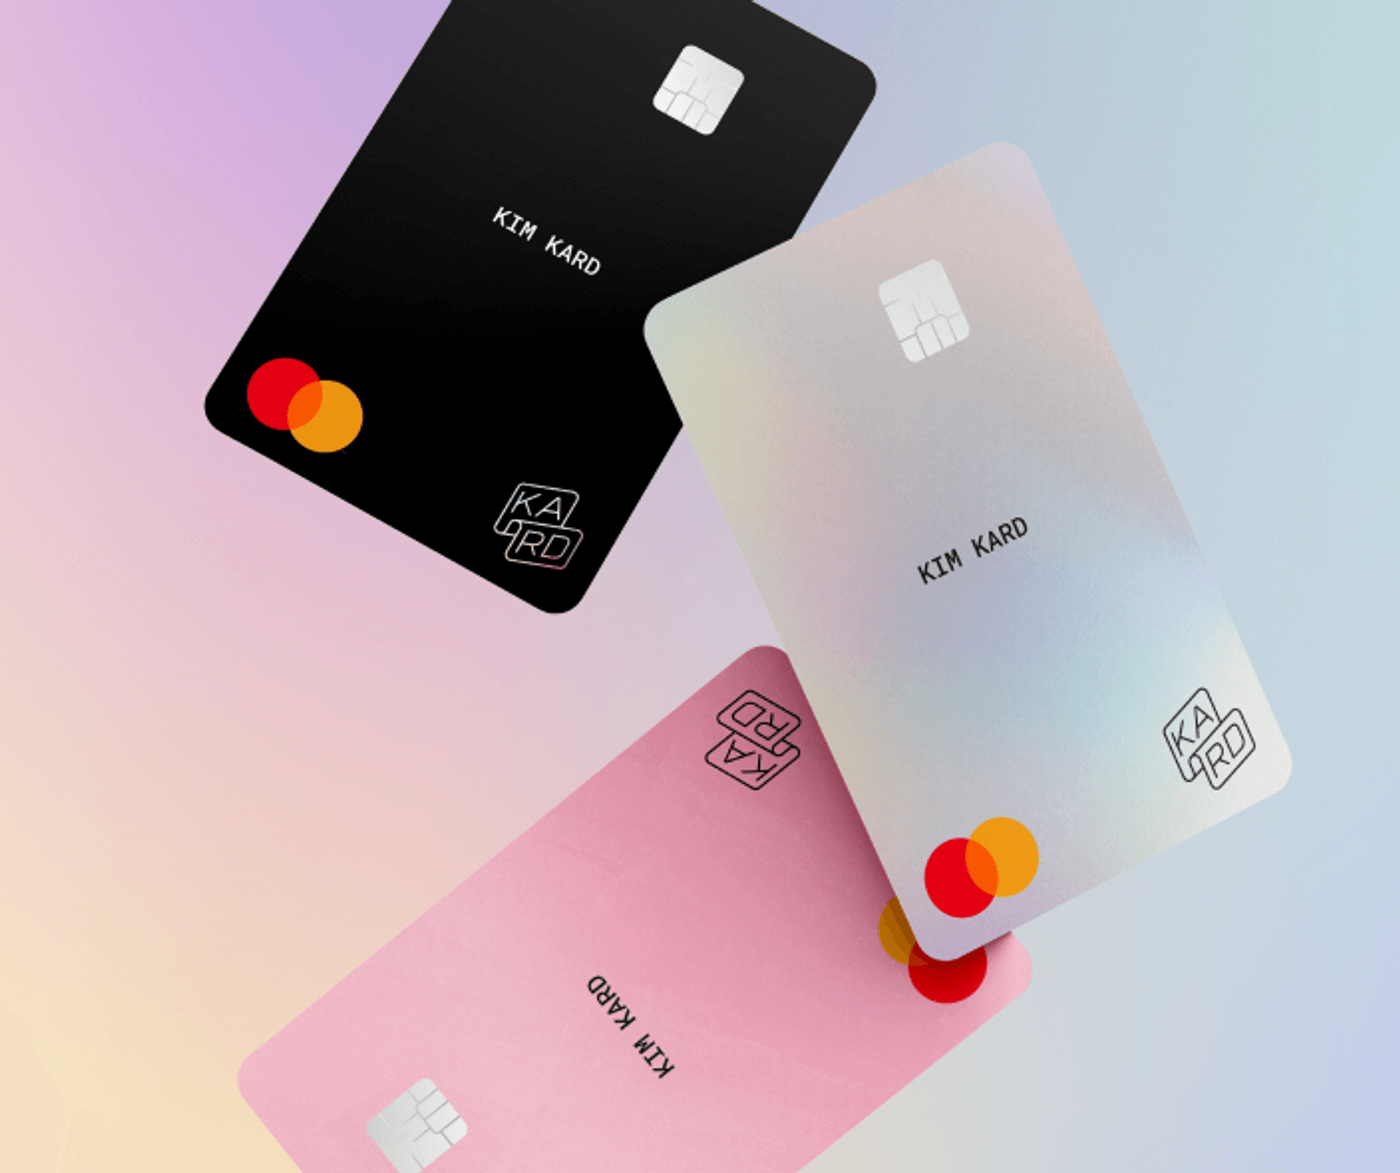 Mockup cartes de paiement Kard